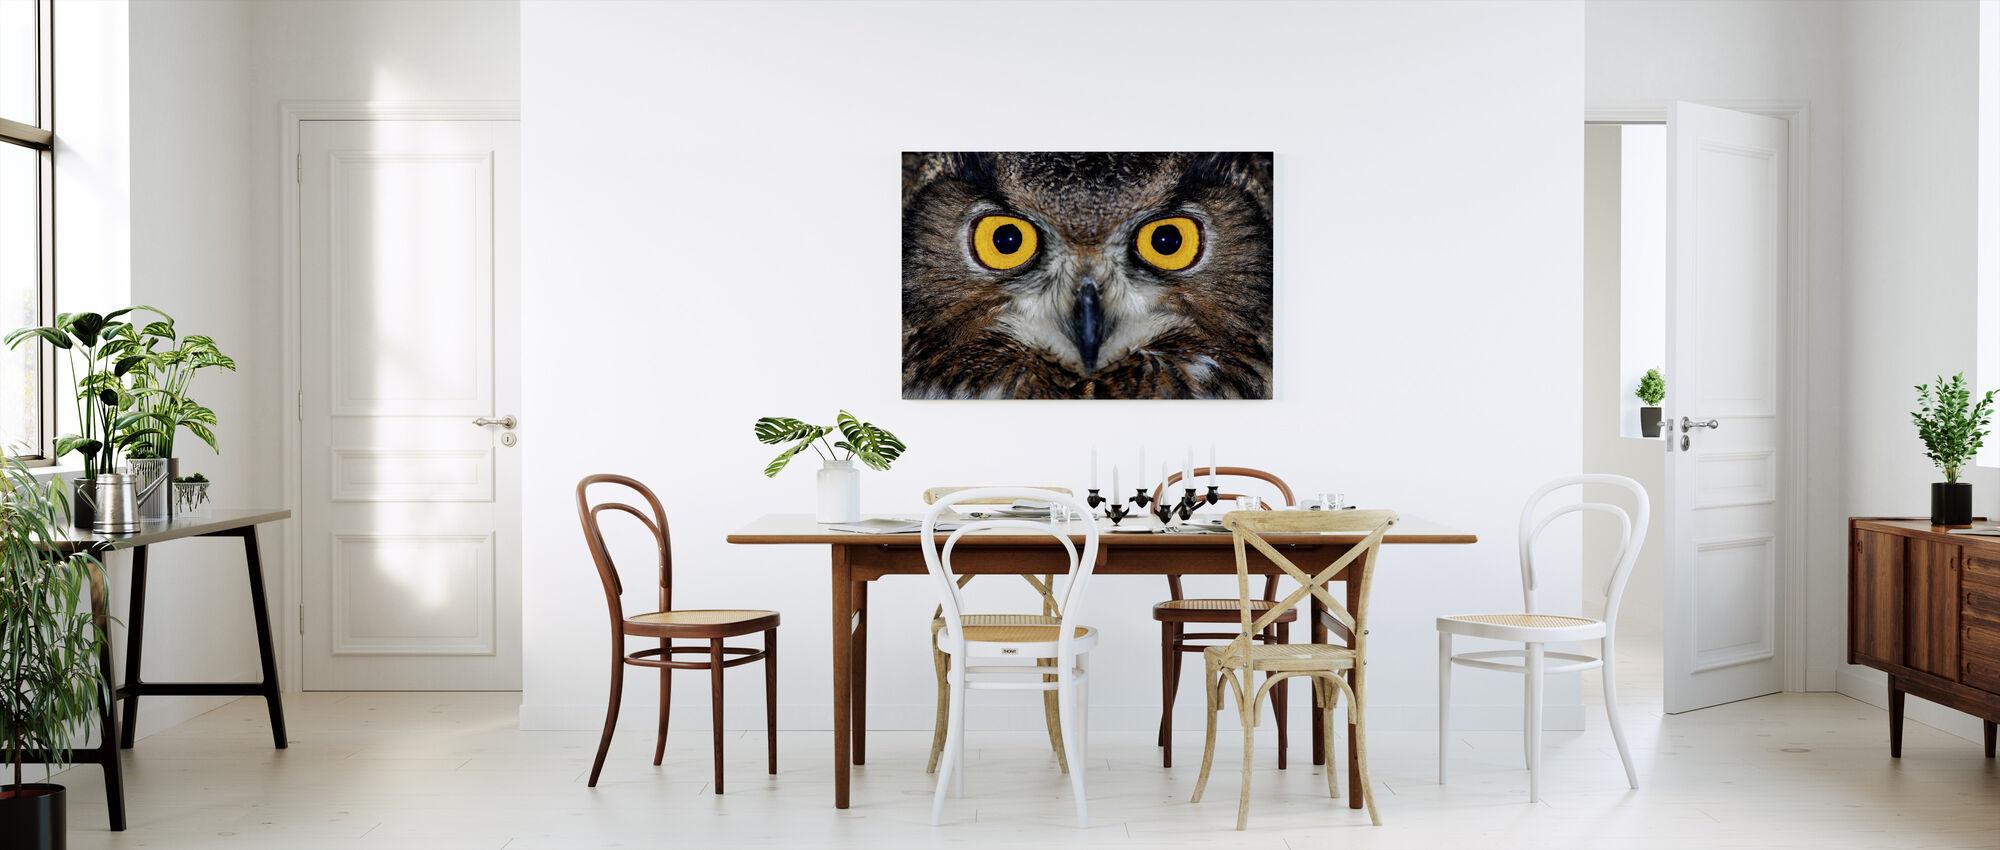 Eagle Owl Eyes - Canvas print - Kitchen